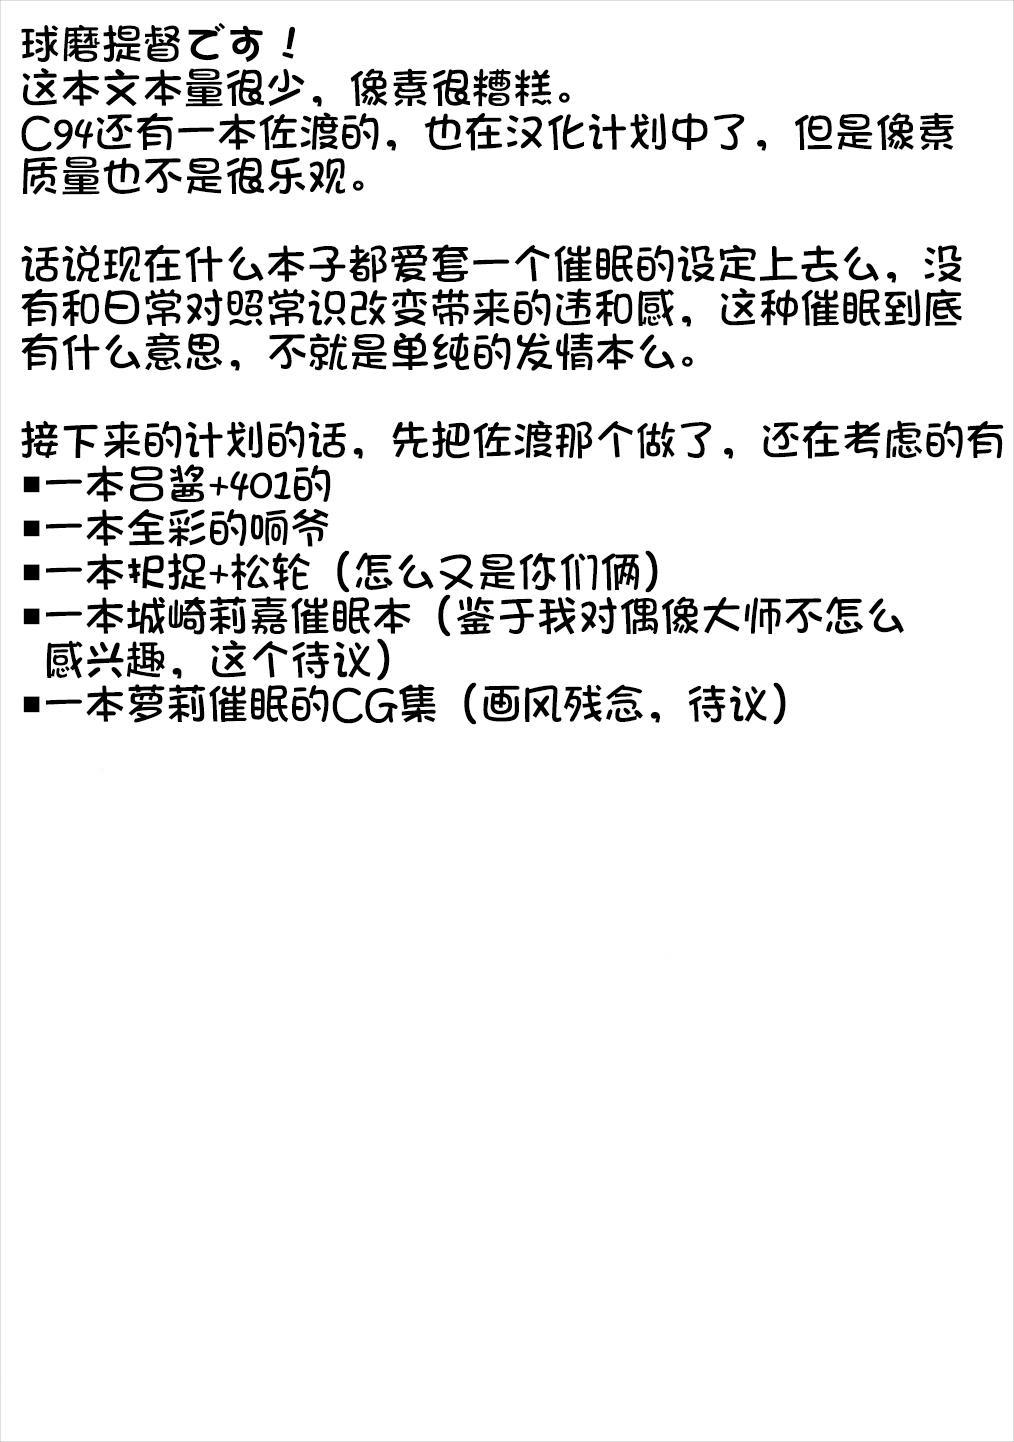 (C93) [Yakimisomura (Utaki)] Matsuwa-chan Etorofu-chan Gomennasai (Kantai Collection -KanColle-) [Chinese] [球磨提督个人汉化] 23